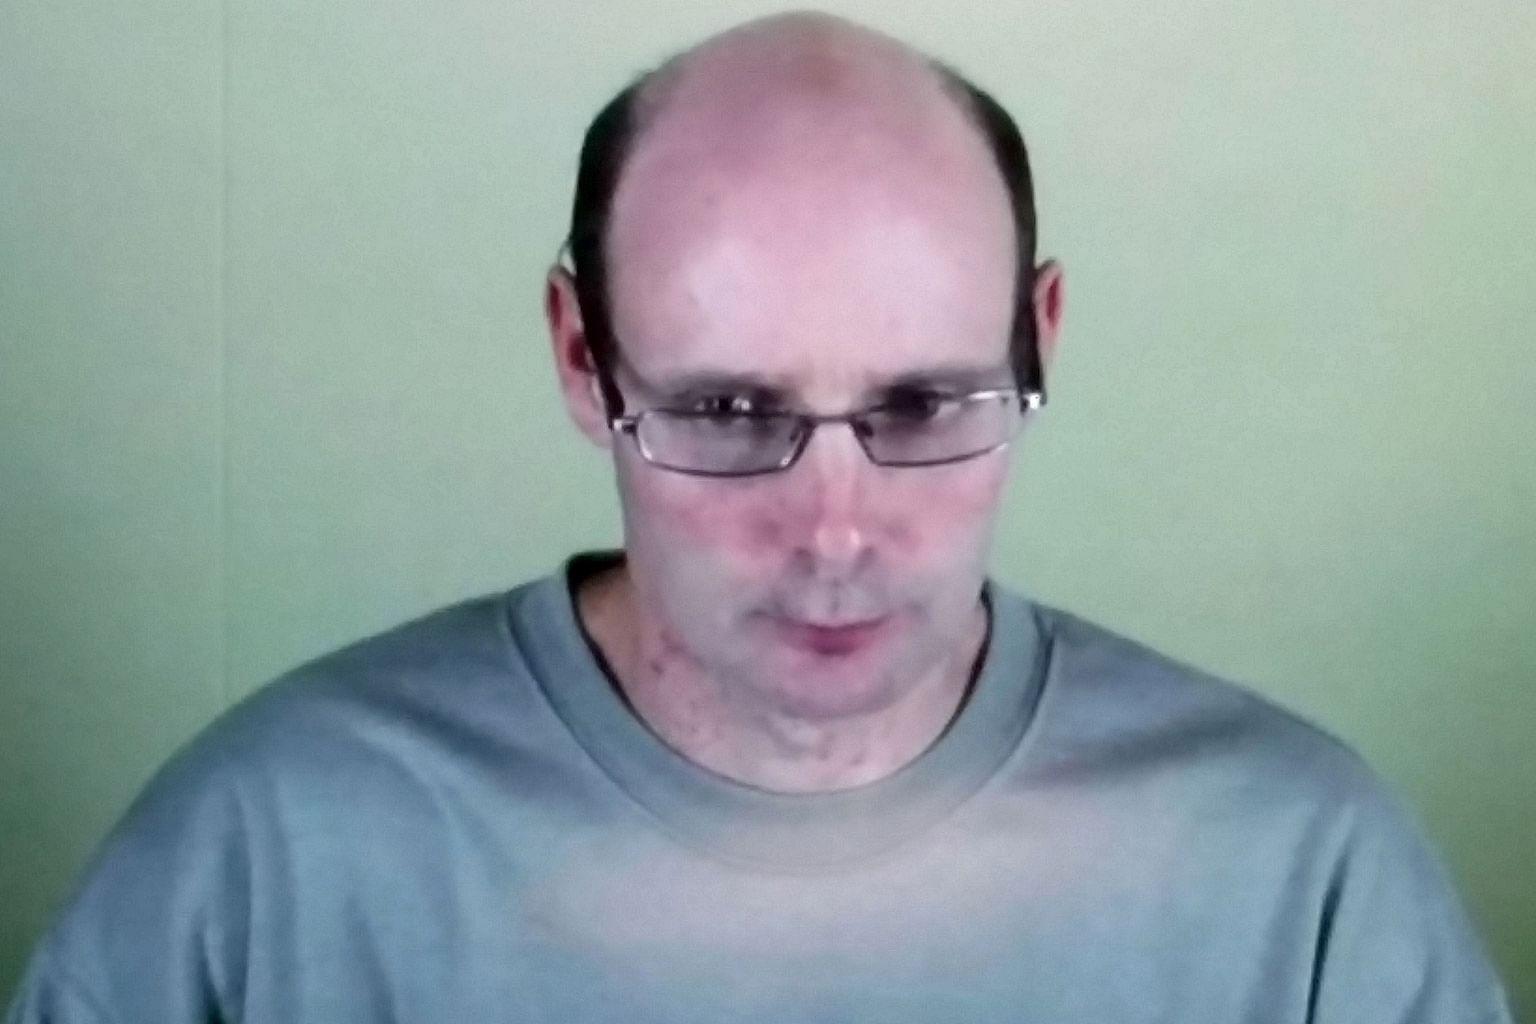 NZ killer wins right to wear toupee in jail, World News & Top